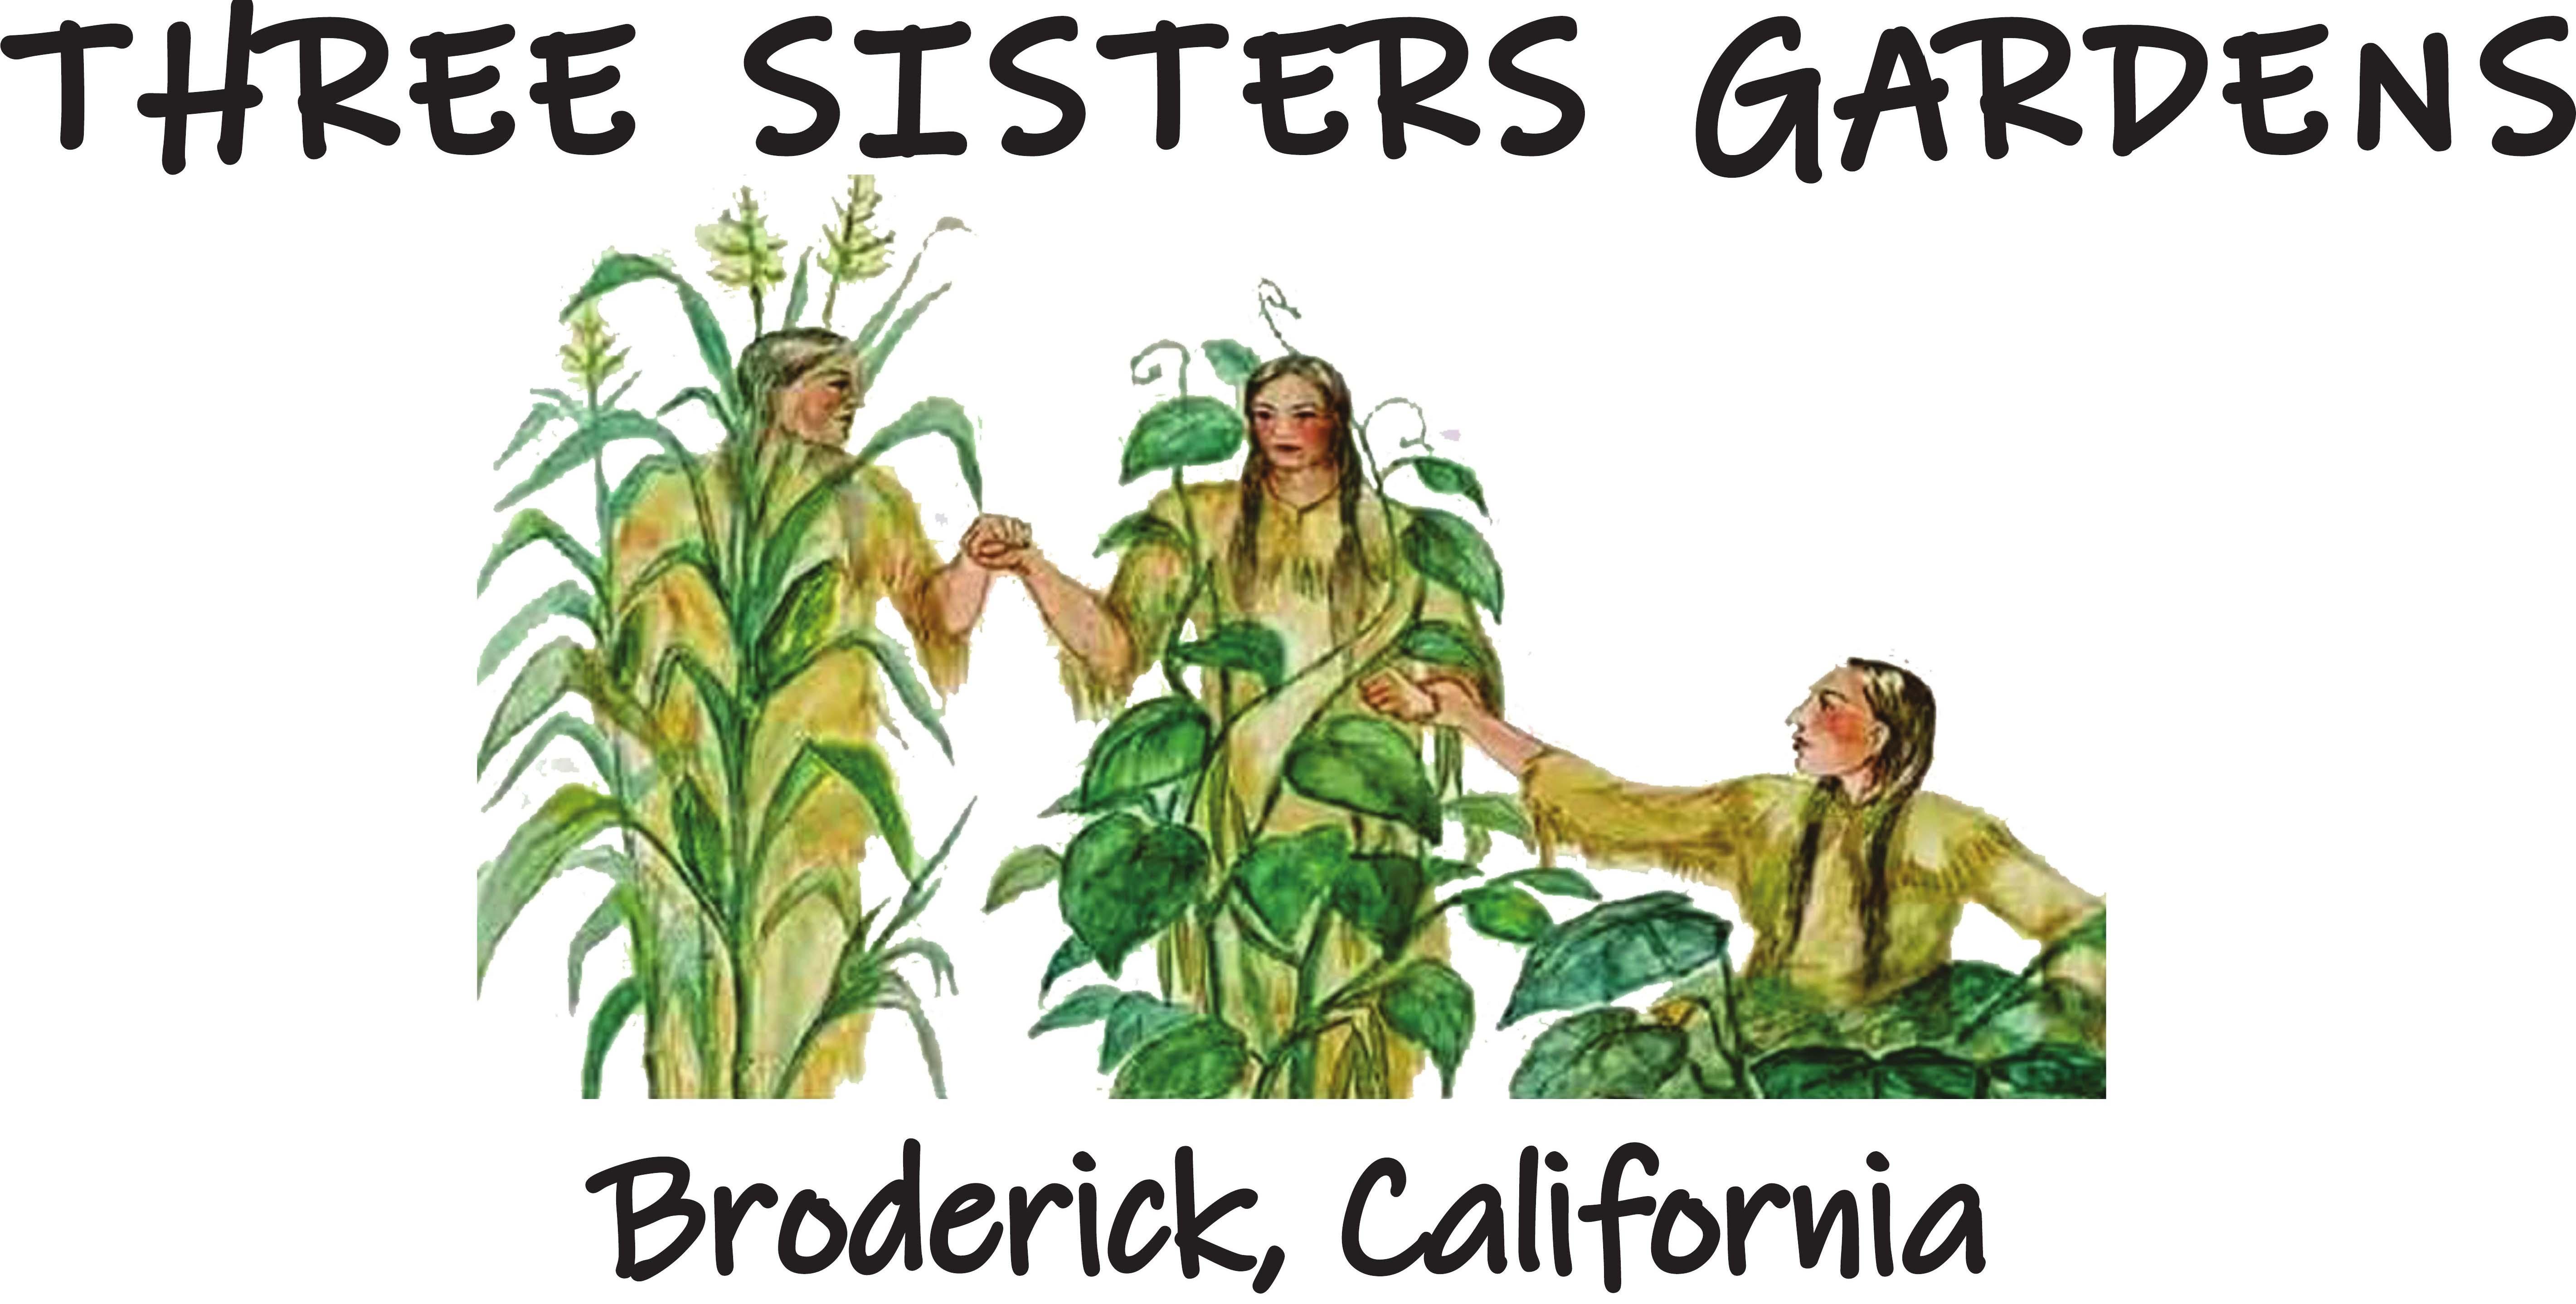 Three Sisters Gardens